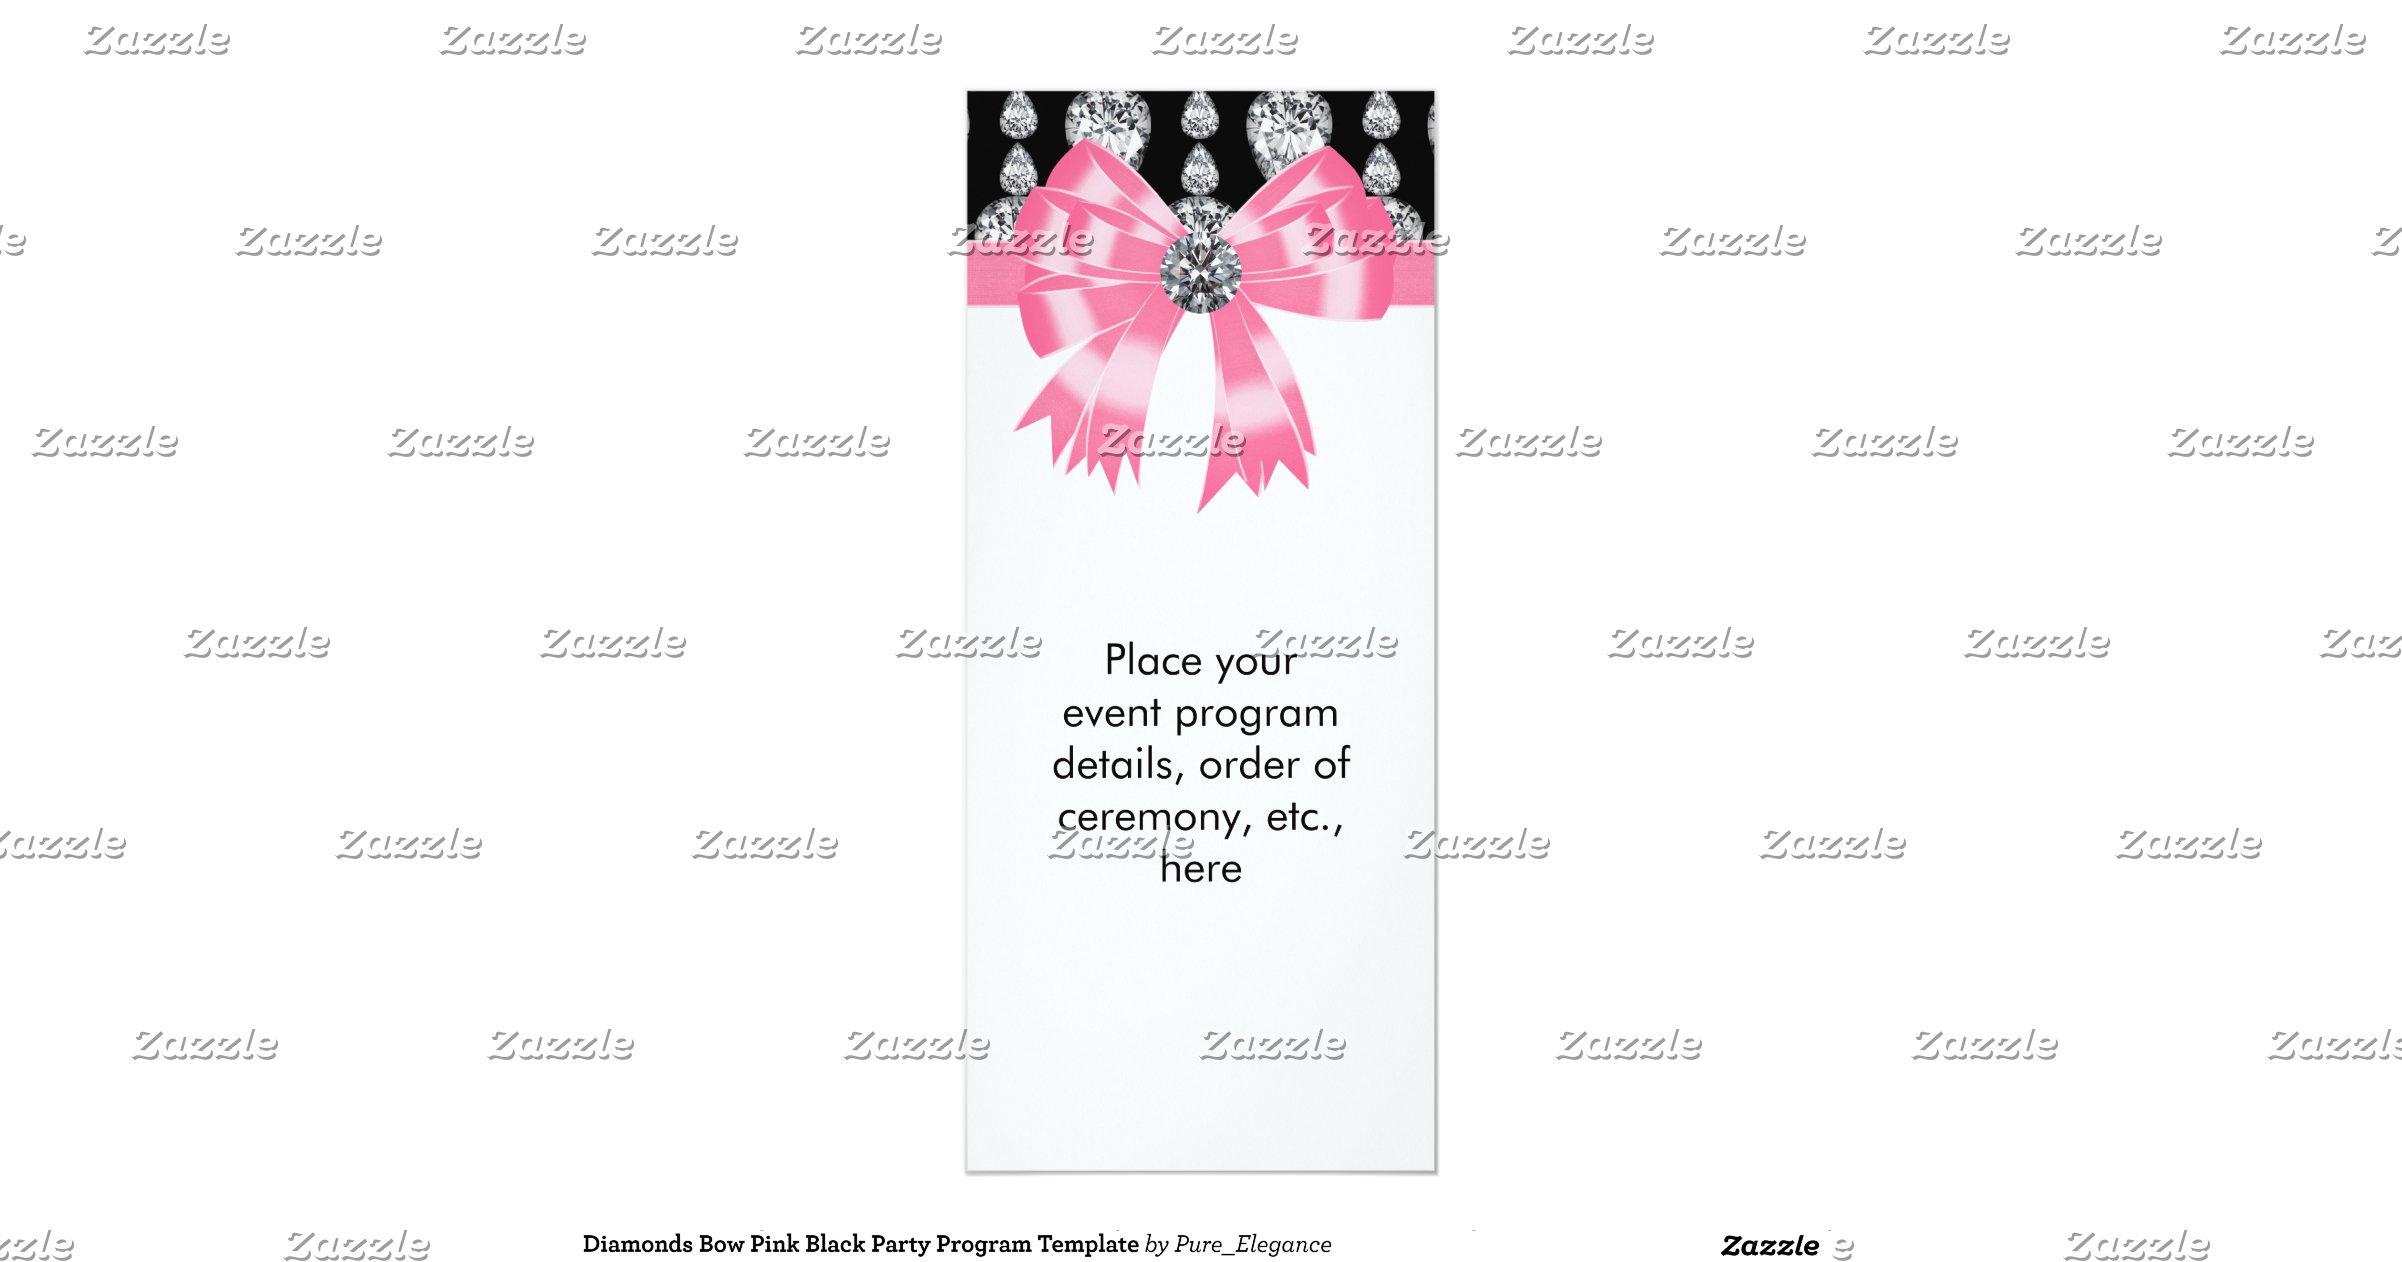 Diamonds Bow Pink Black Party Program Template 4x9.25